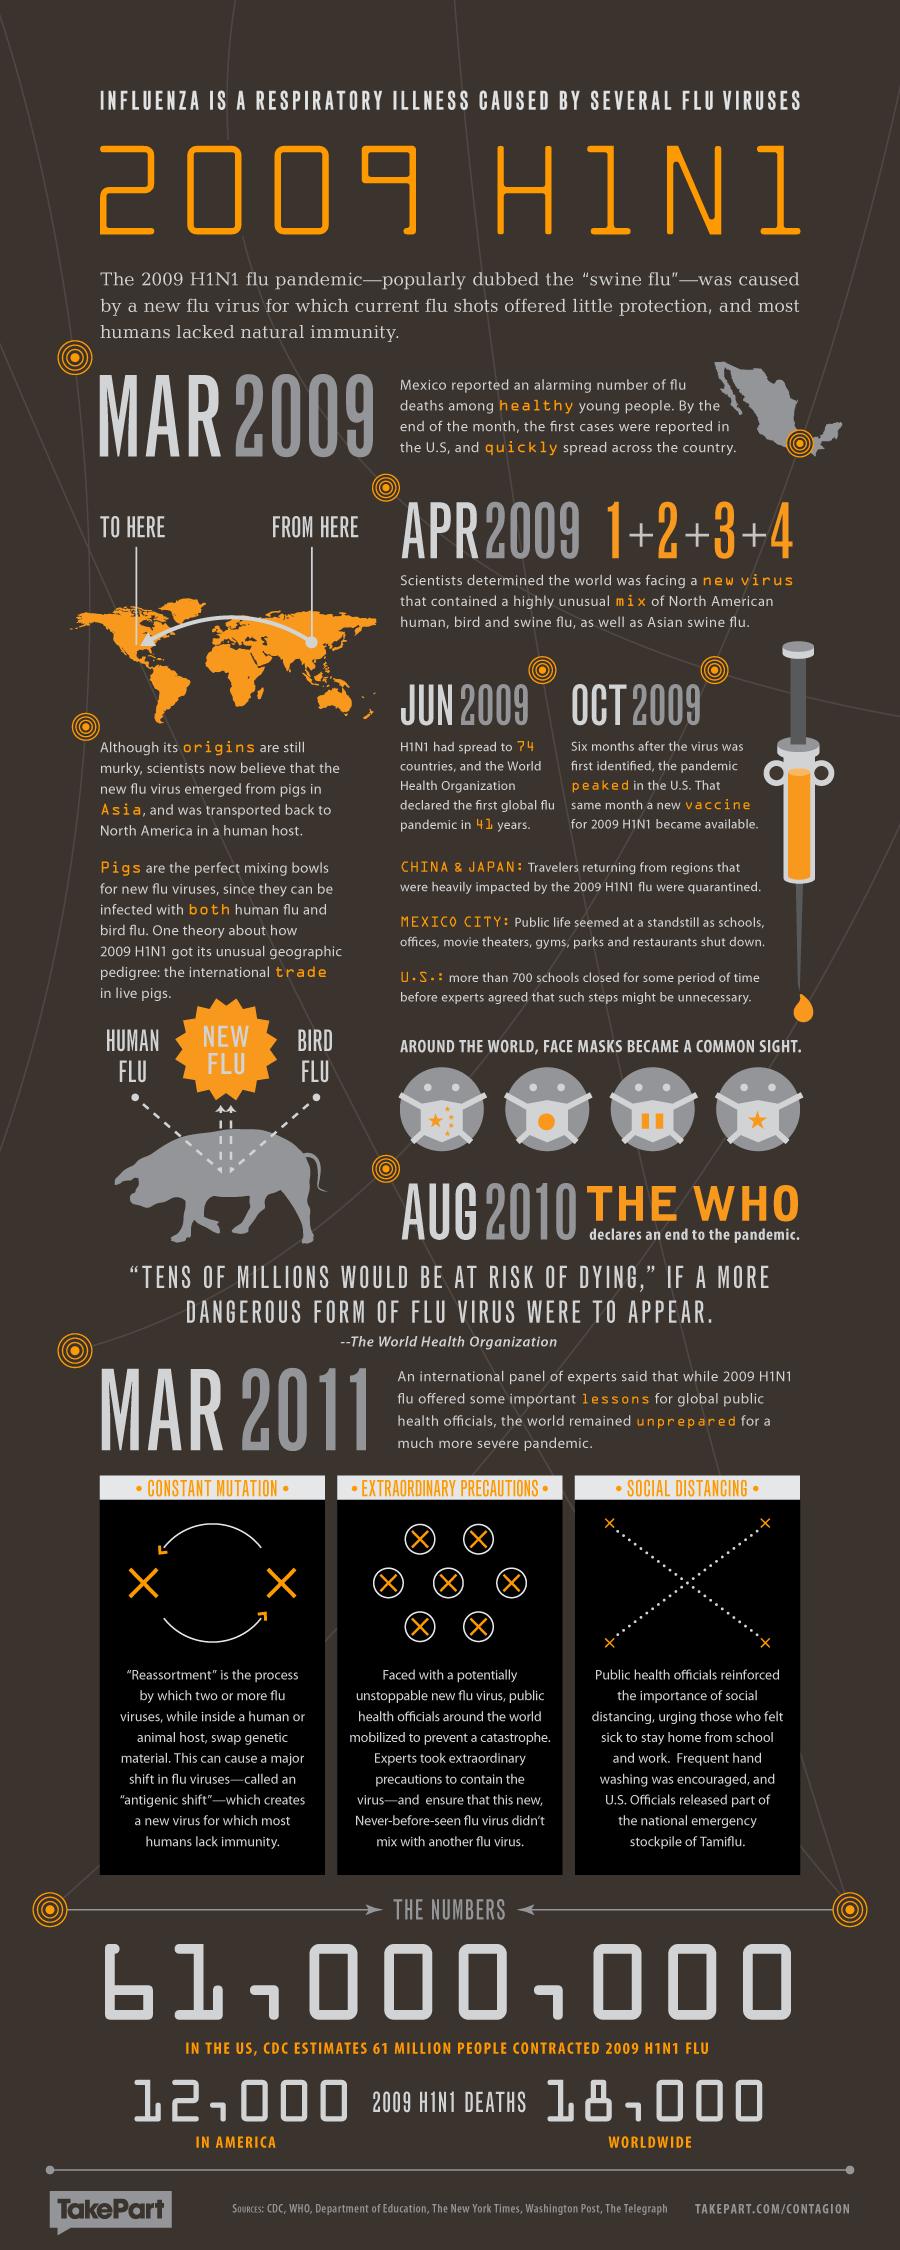 Contagion Health Infographic - H1N1 Swine Flu